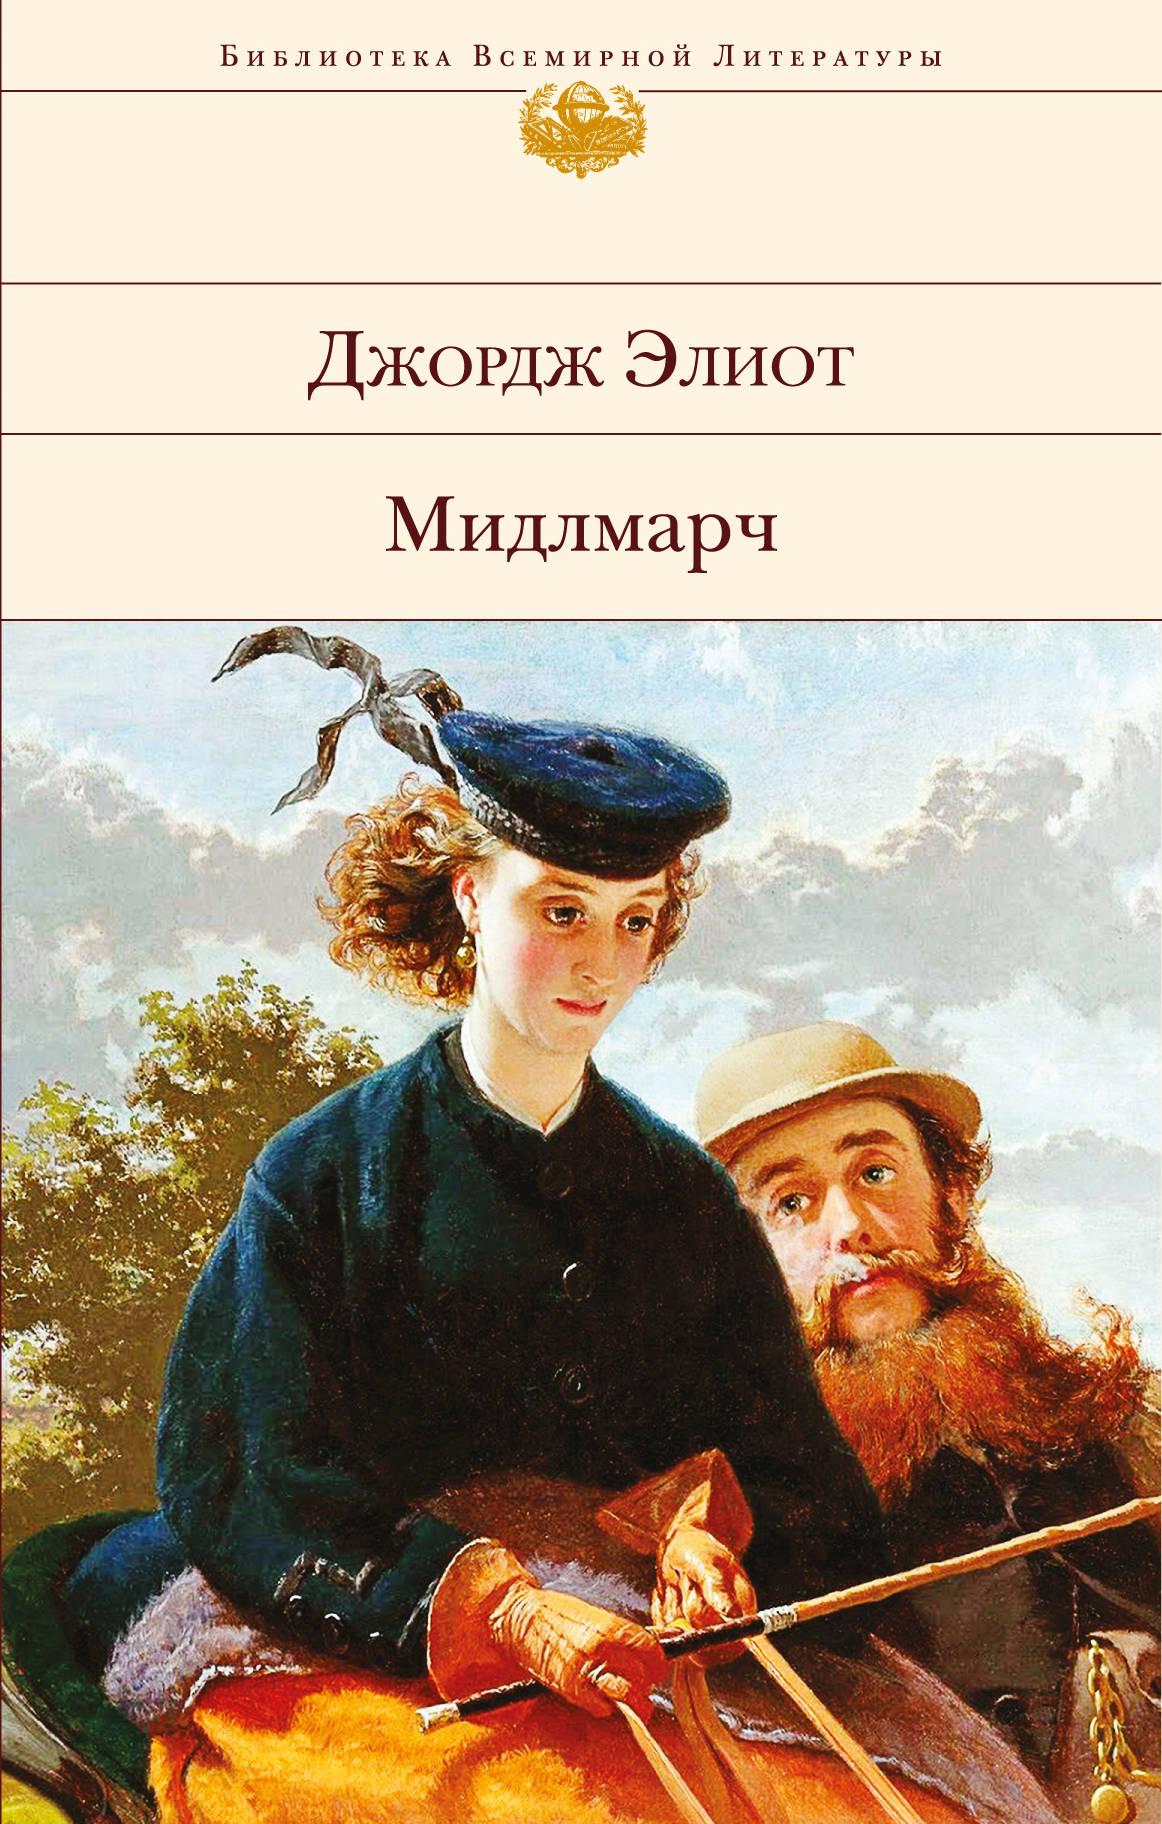 Элиот Джордж Мидлмарч